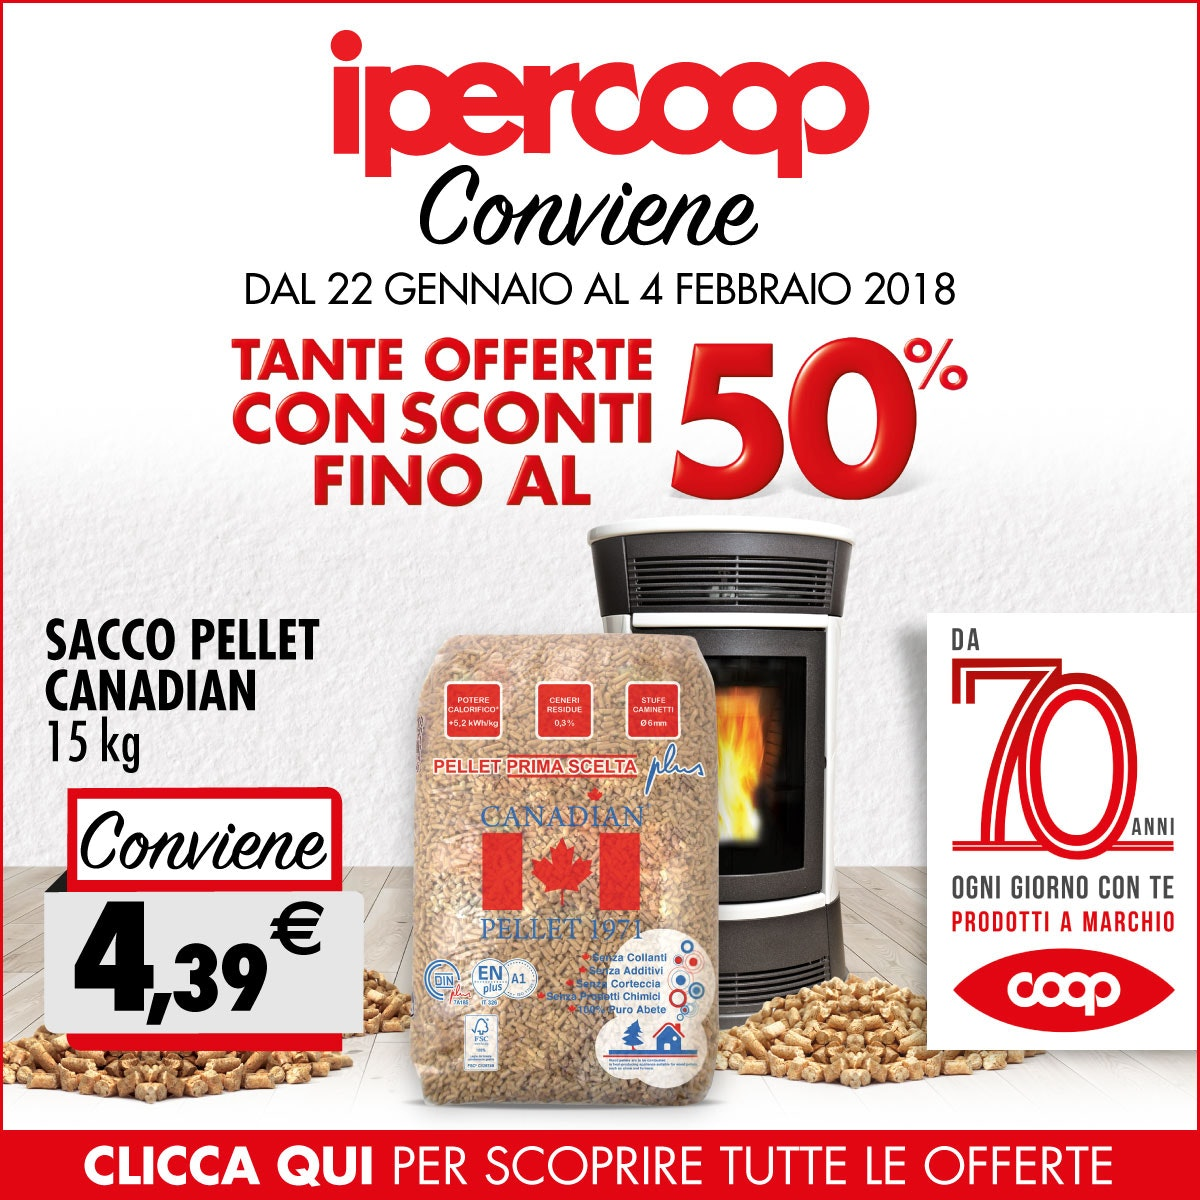 Best Orari Le Terrazze La Spezia Images - Idee Arredamento Casa ...